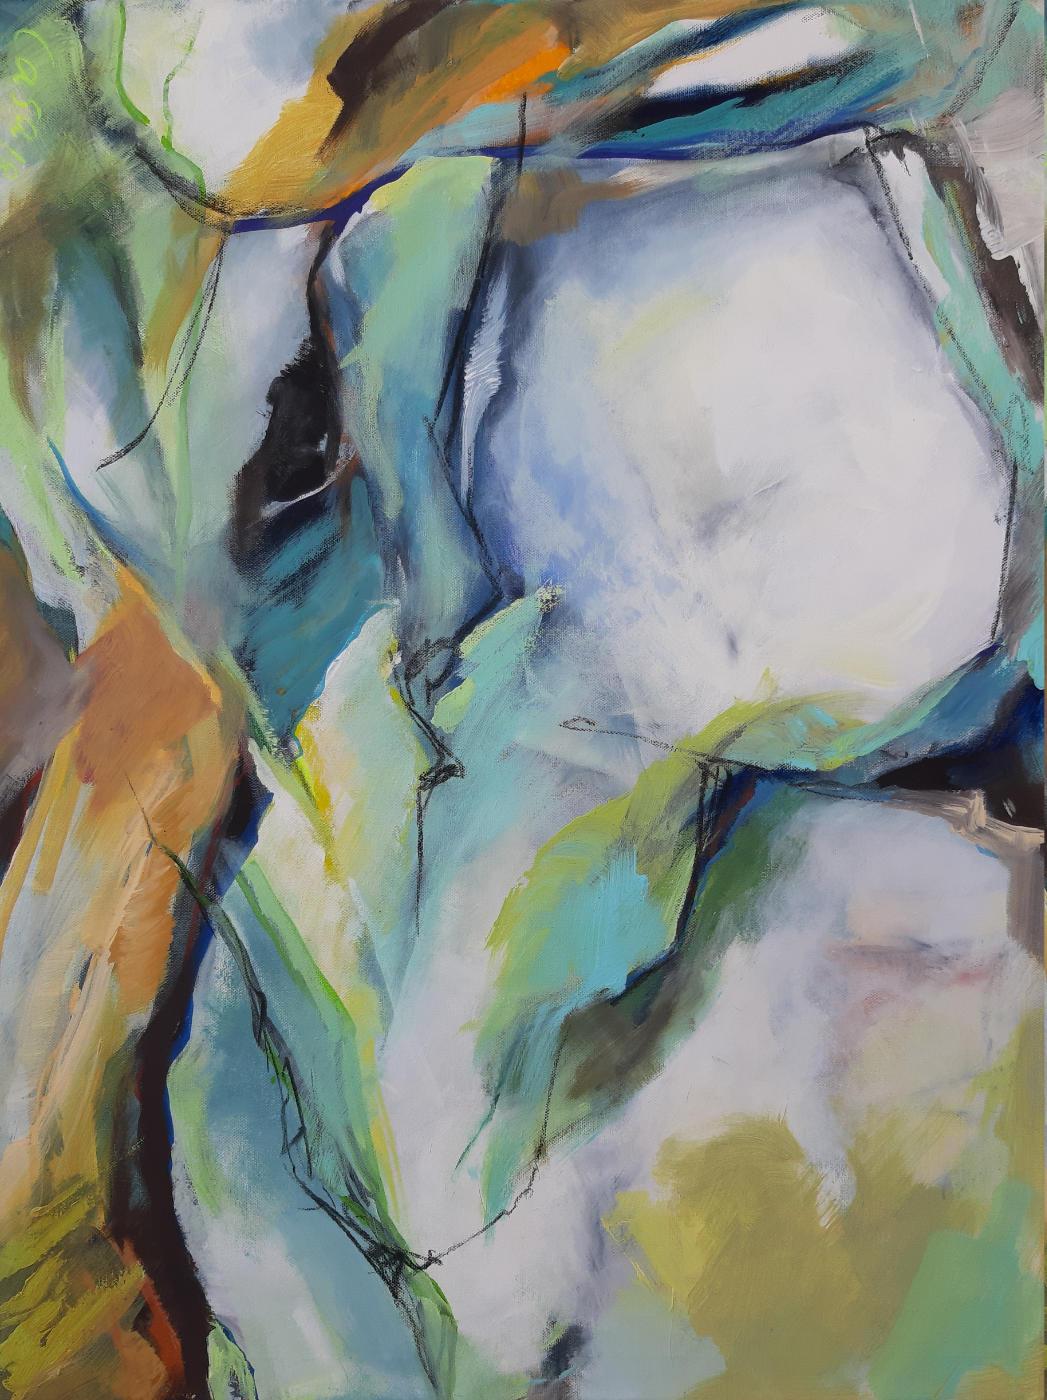 Alb V - Acryl, mixed media auf Leinwand, 80 x 60 cm